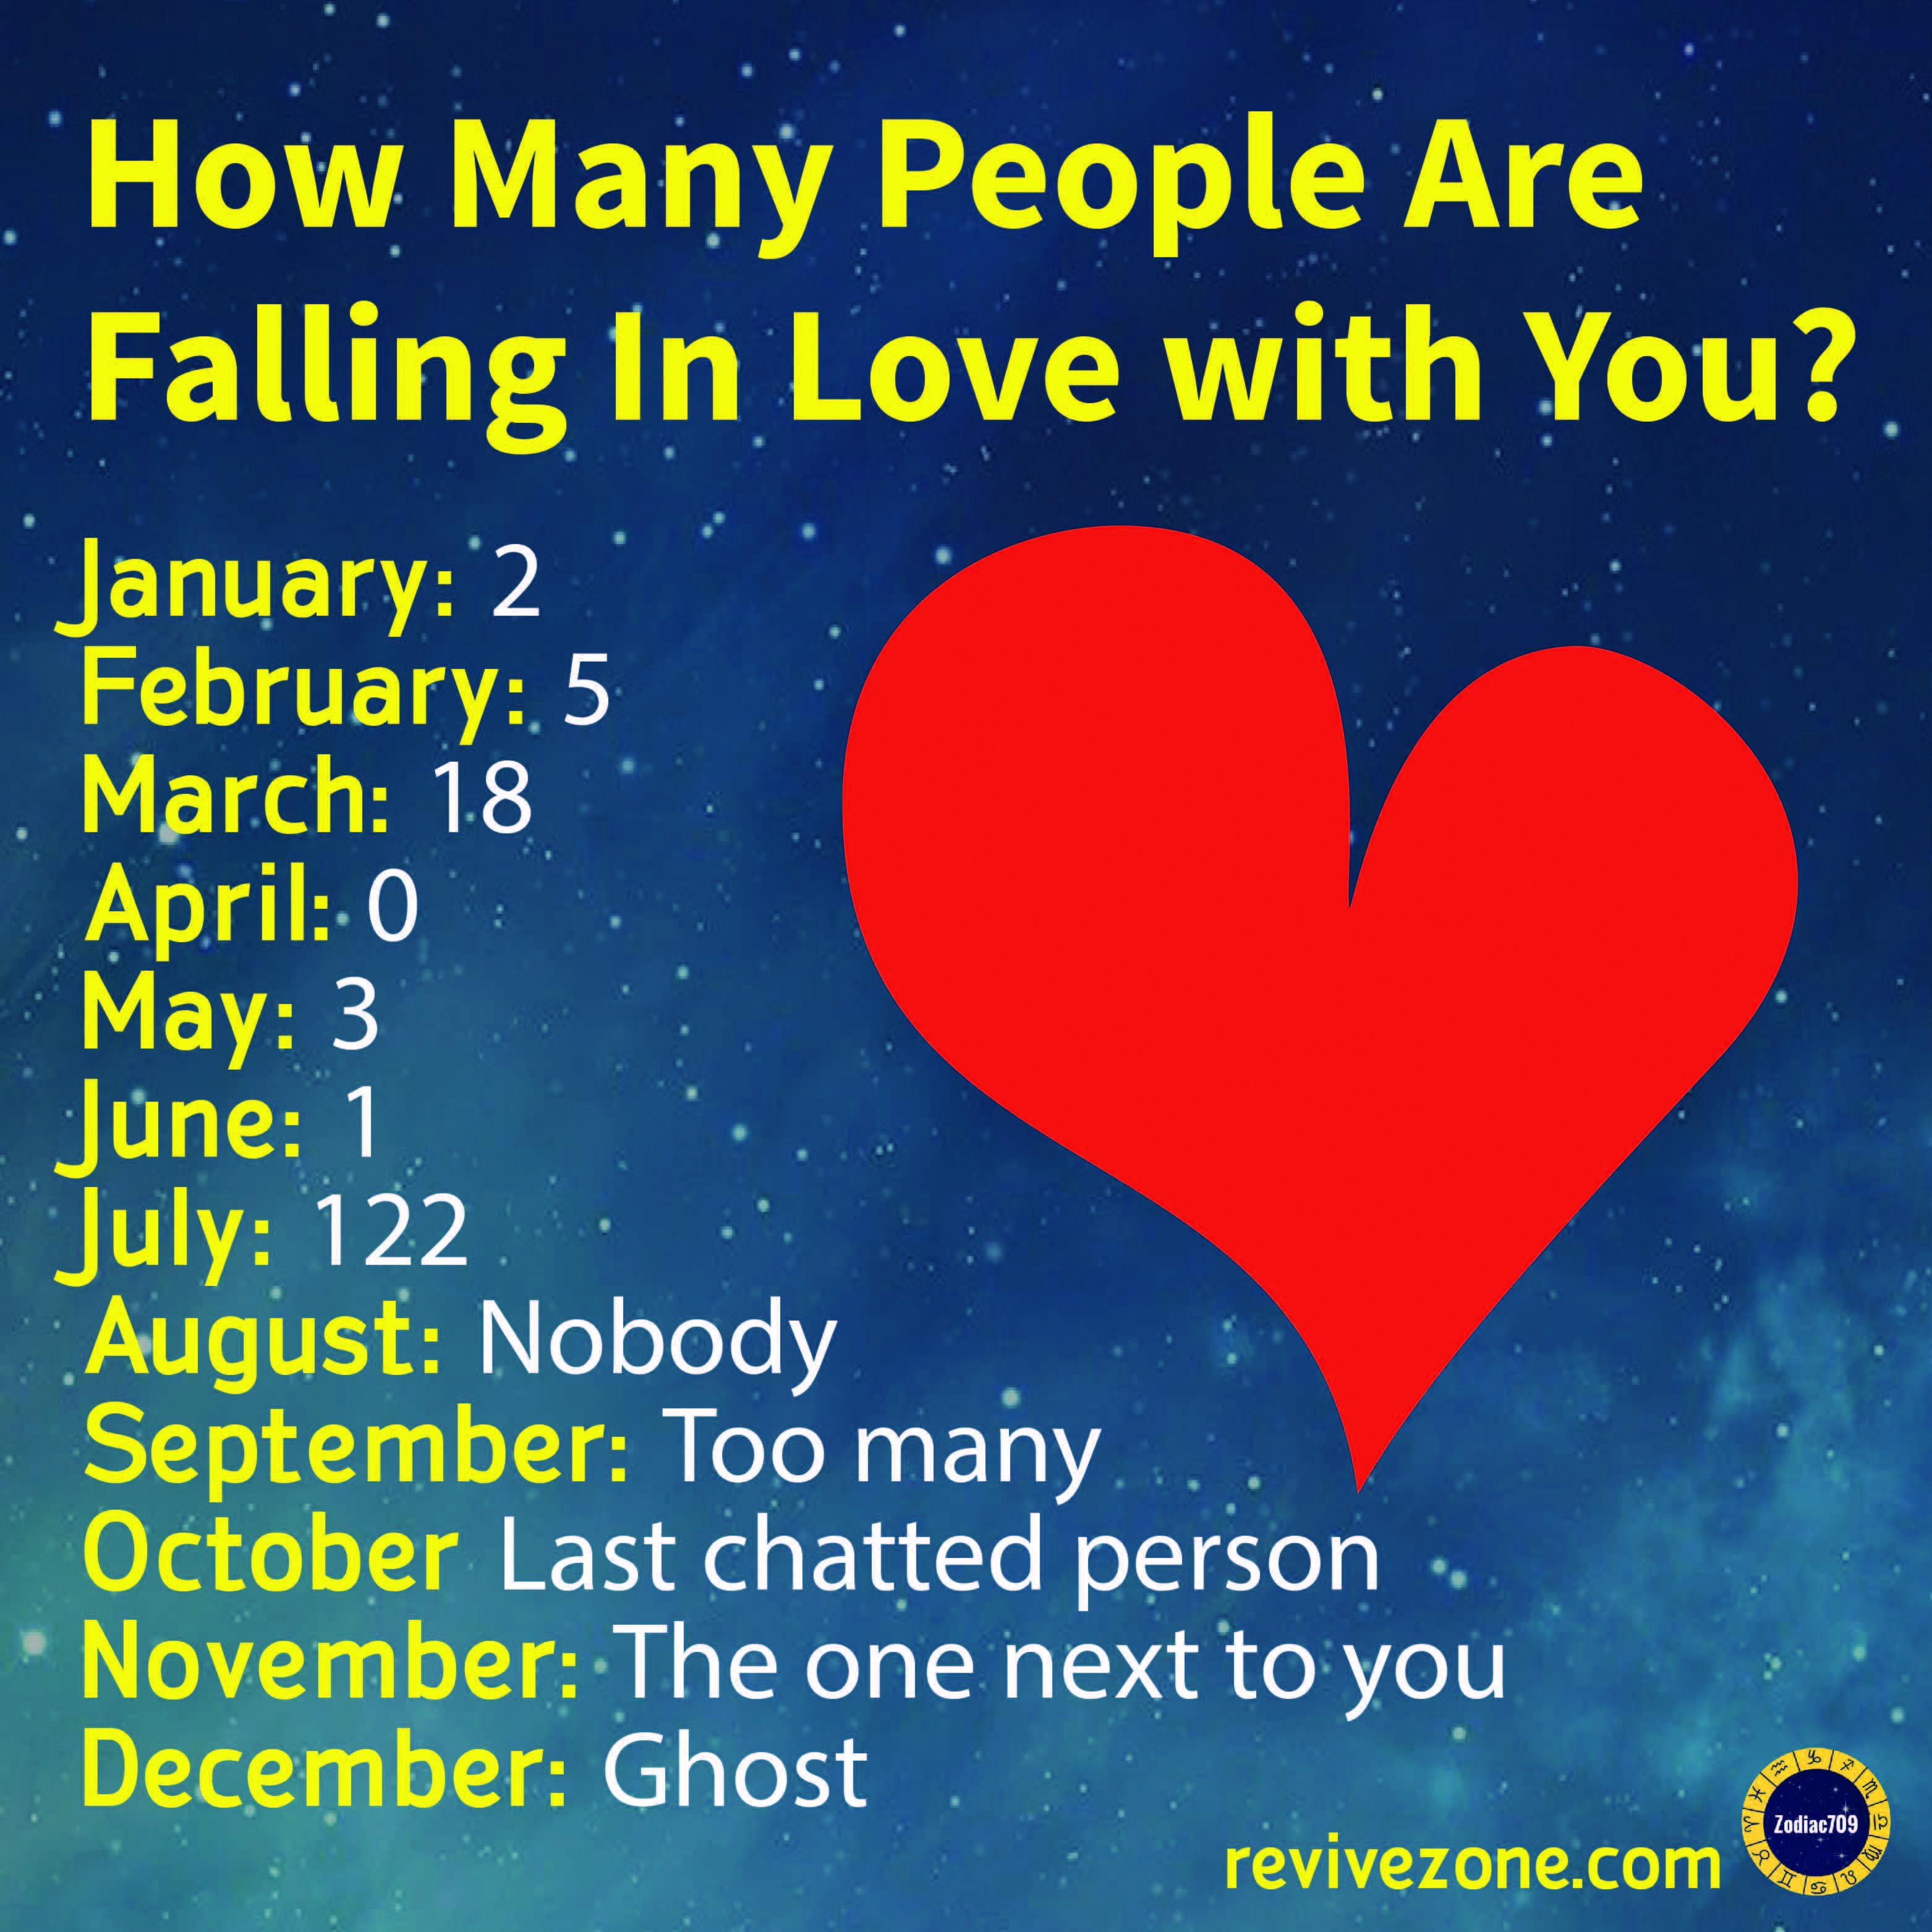 Horoscopesigns Zodiac Signs Funny Zodiac Star Signs Zodiac Signs Horoscope